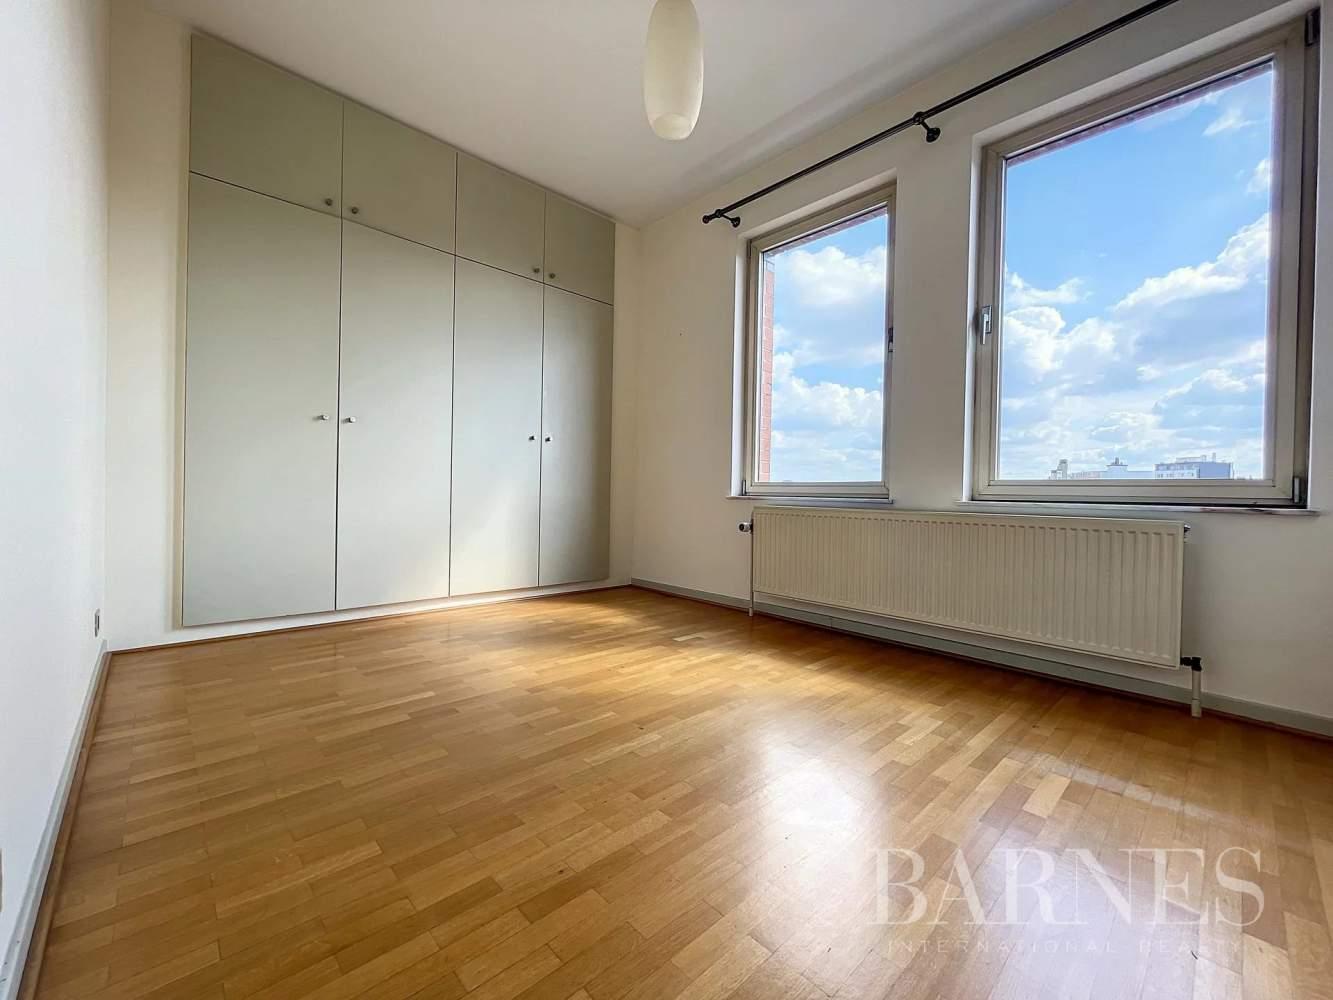 Woluwe-Saint-Lambert  - Appartement 6 Pièces 2 Chambres - picture 10